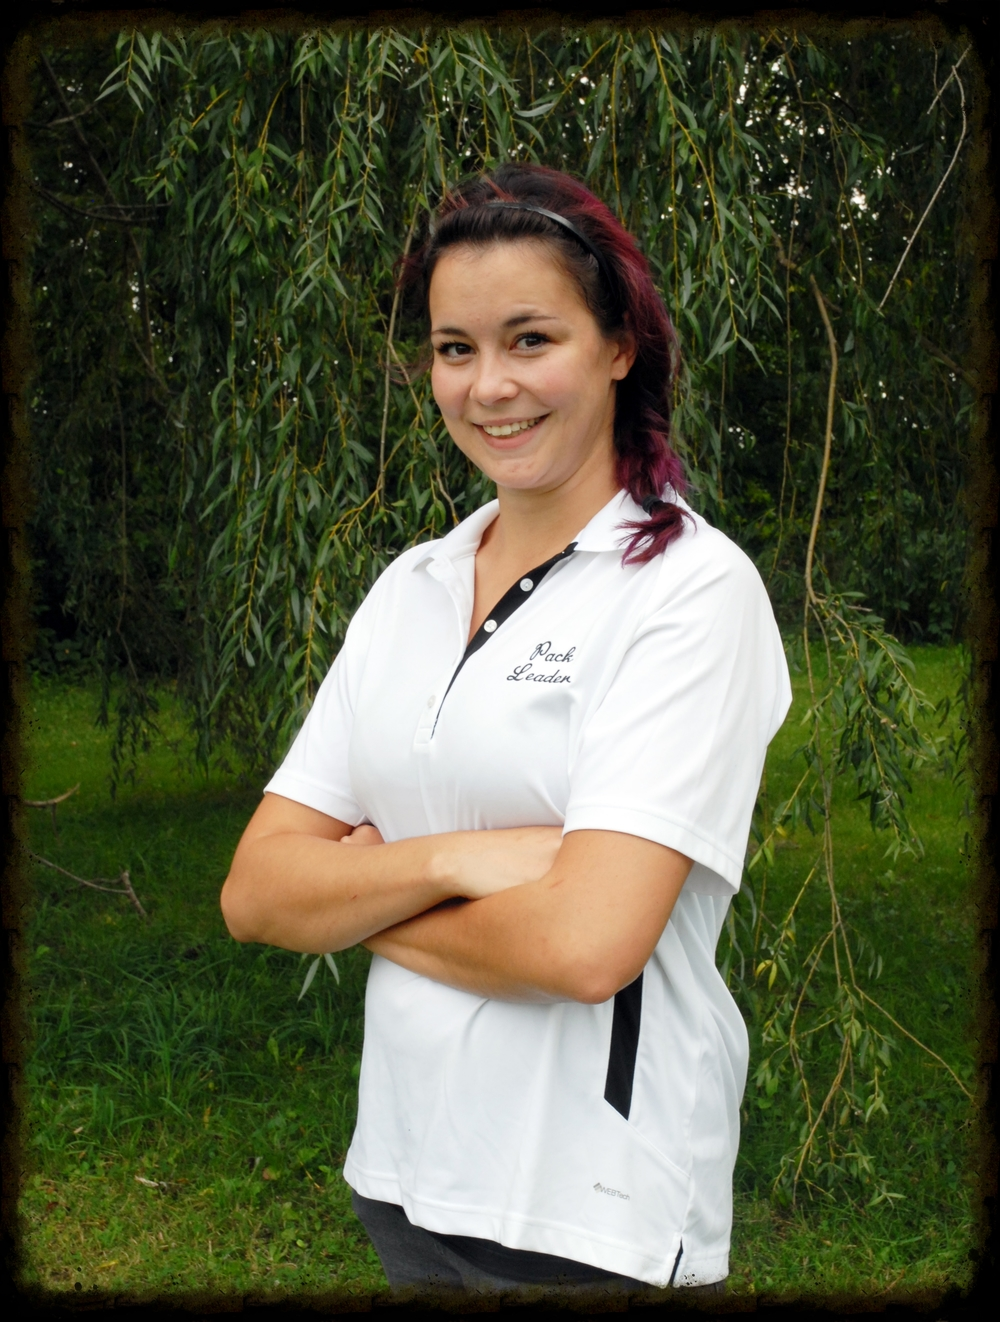 Kyla Stachel